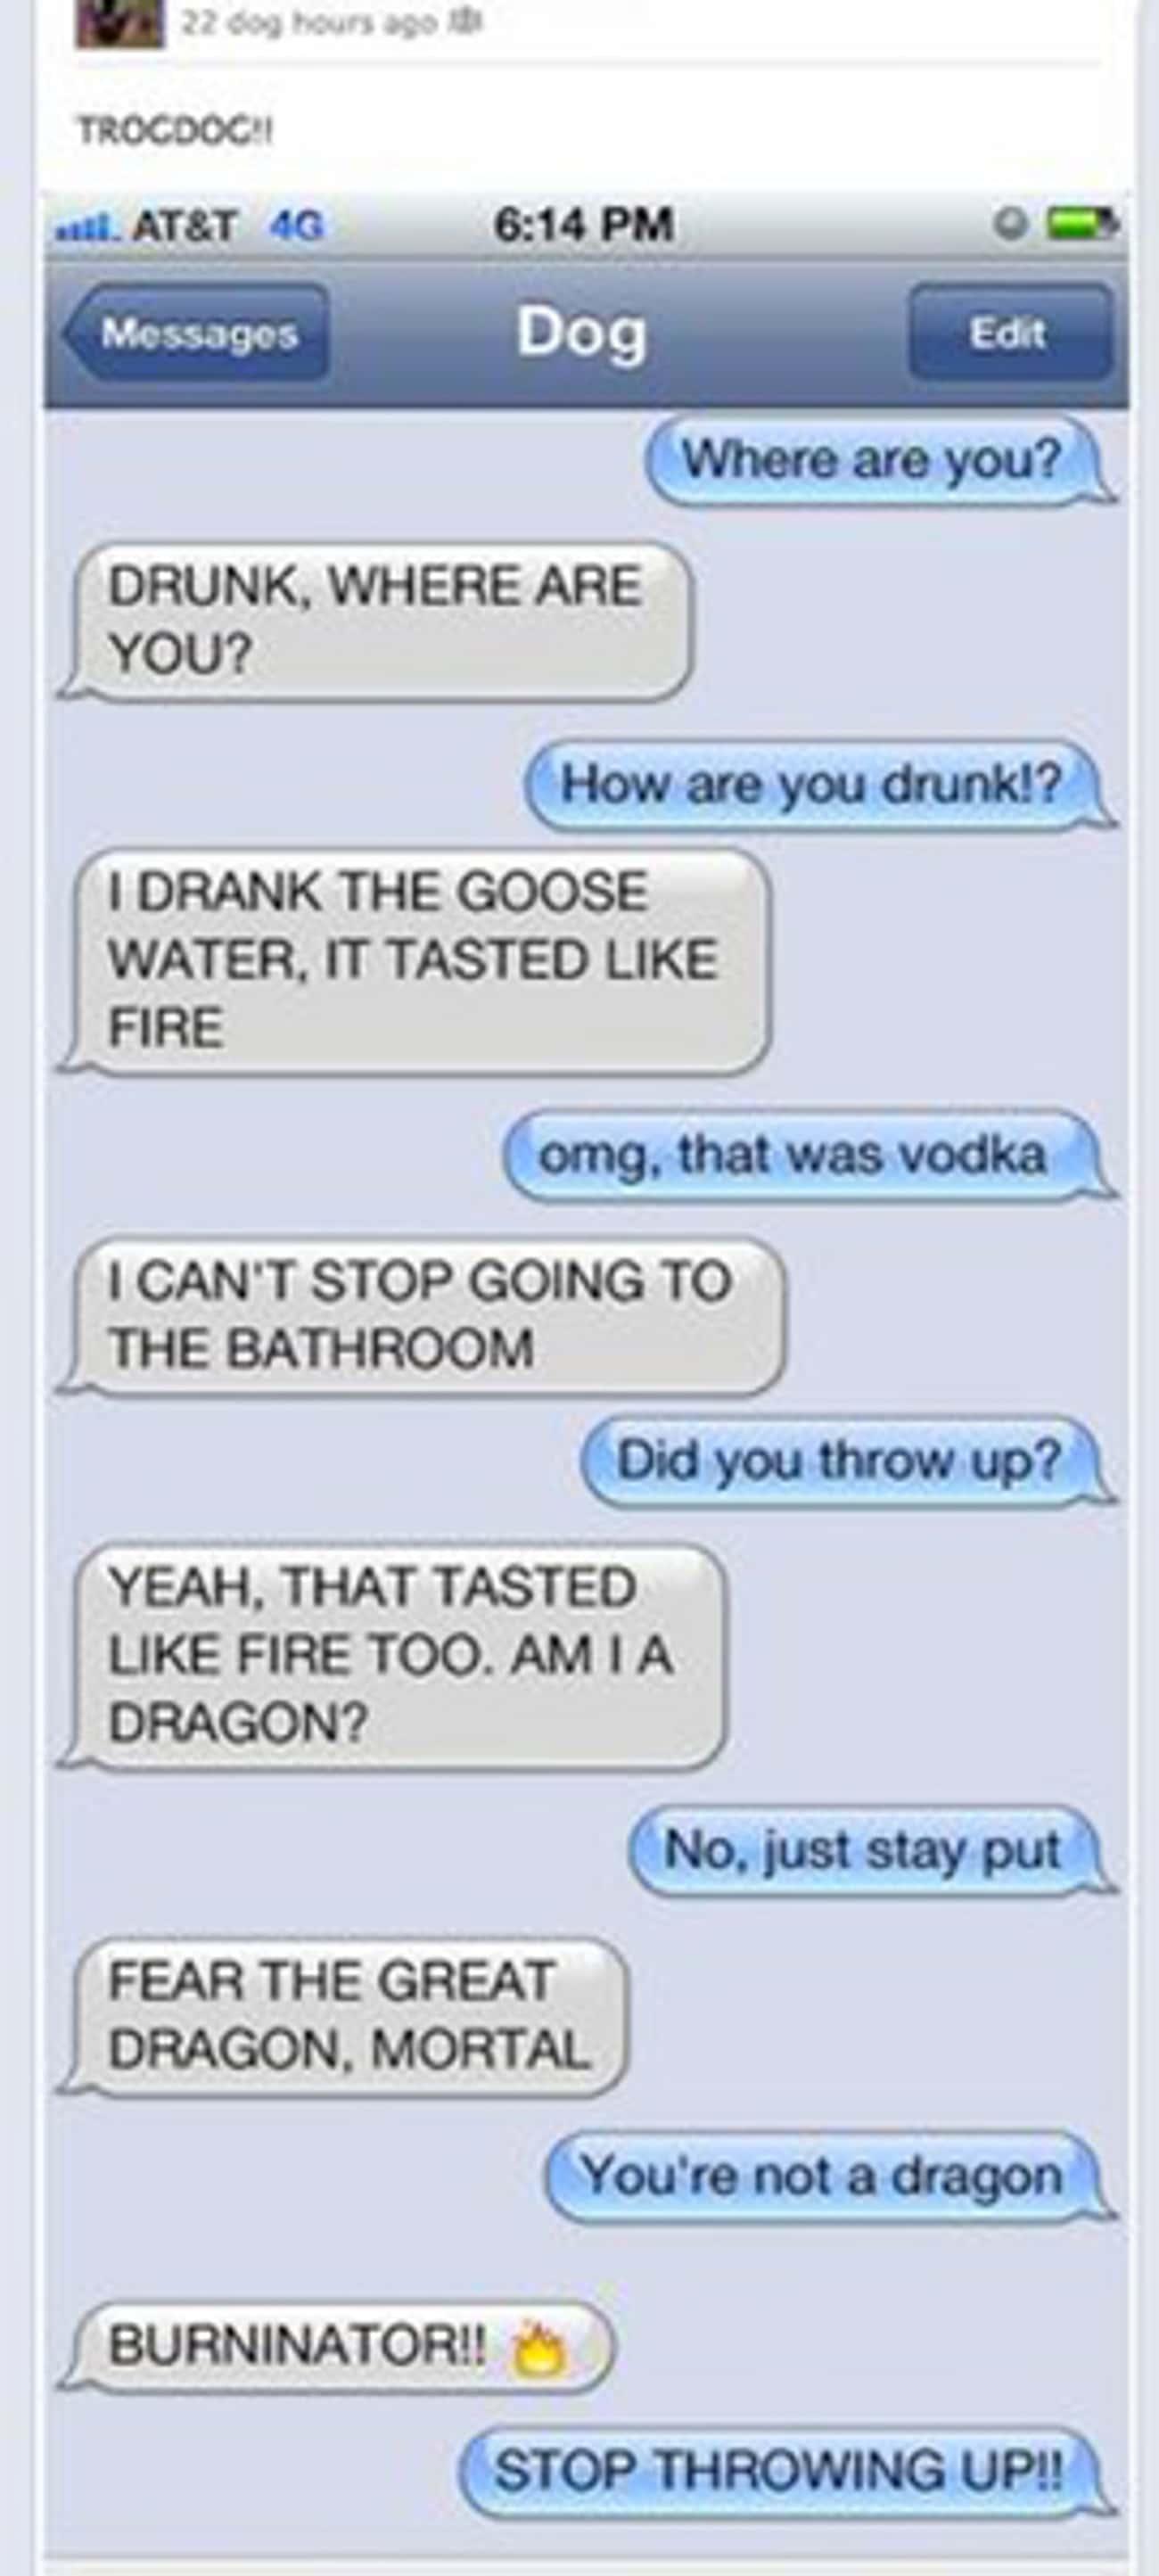 Dragons LOVE Goose Water